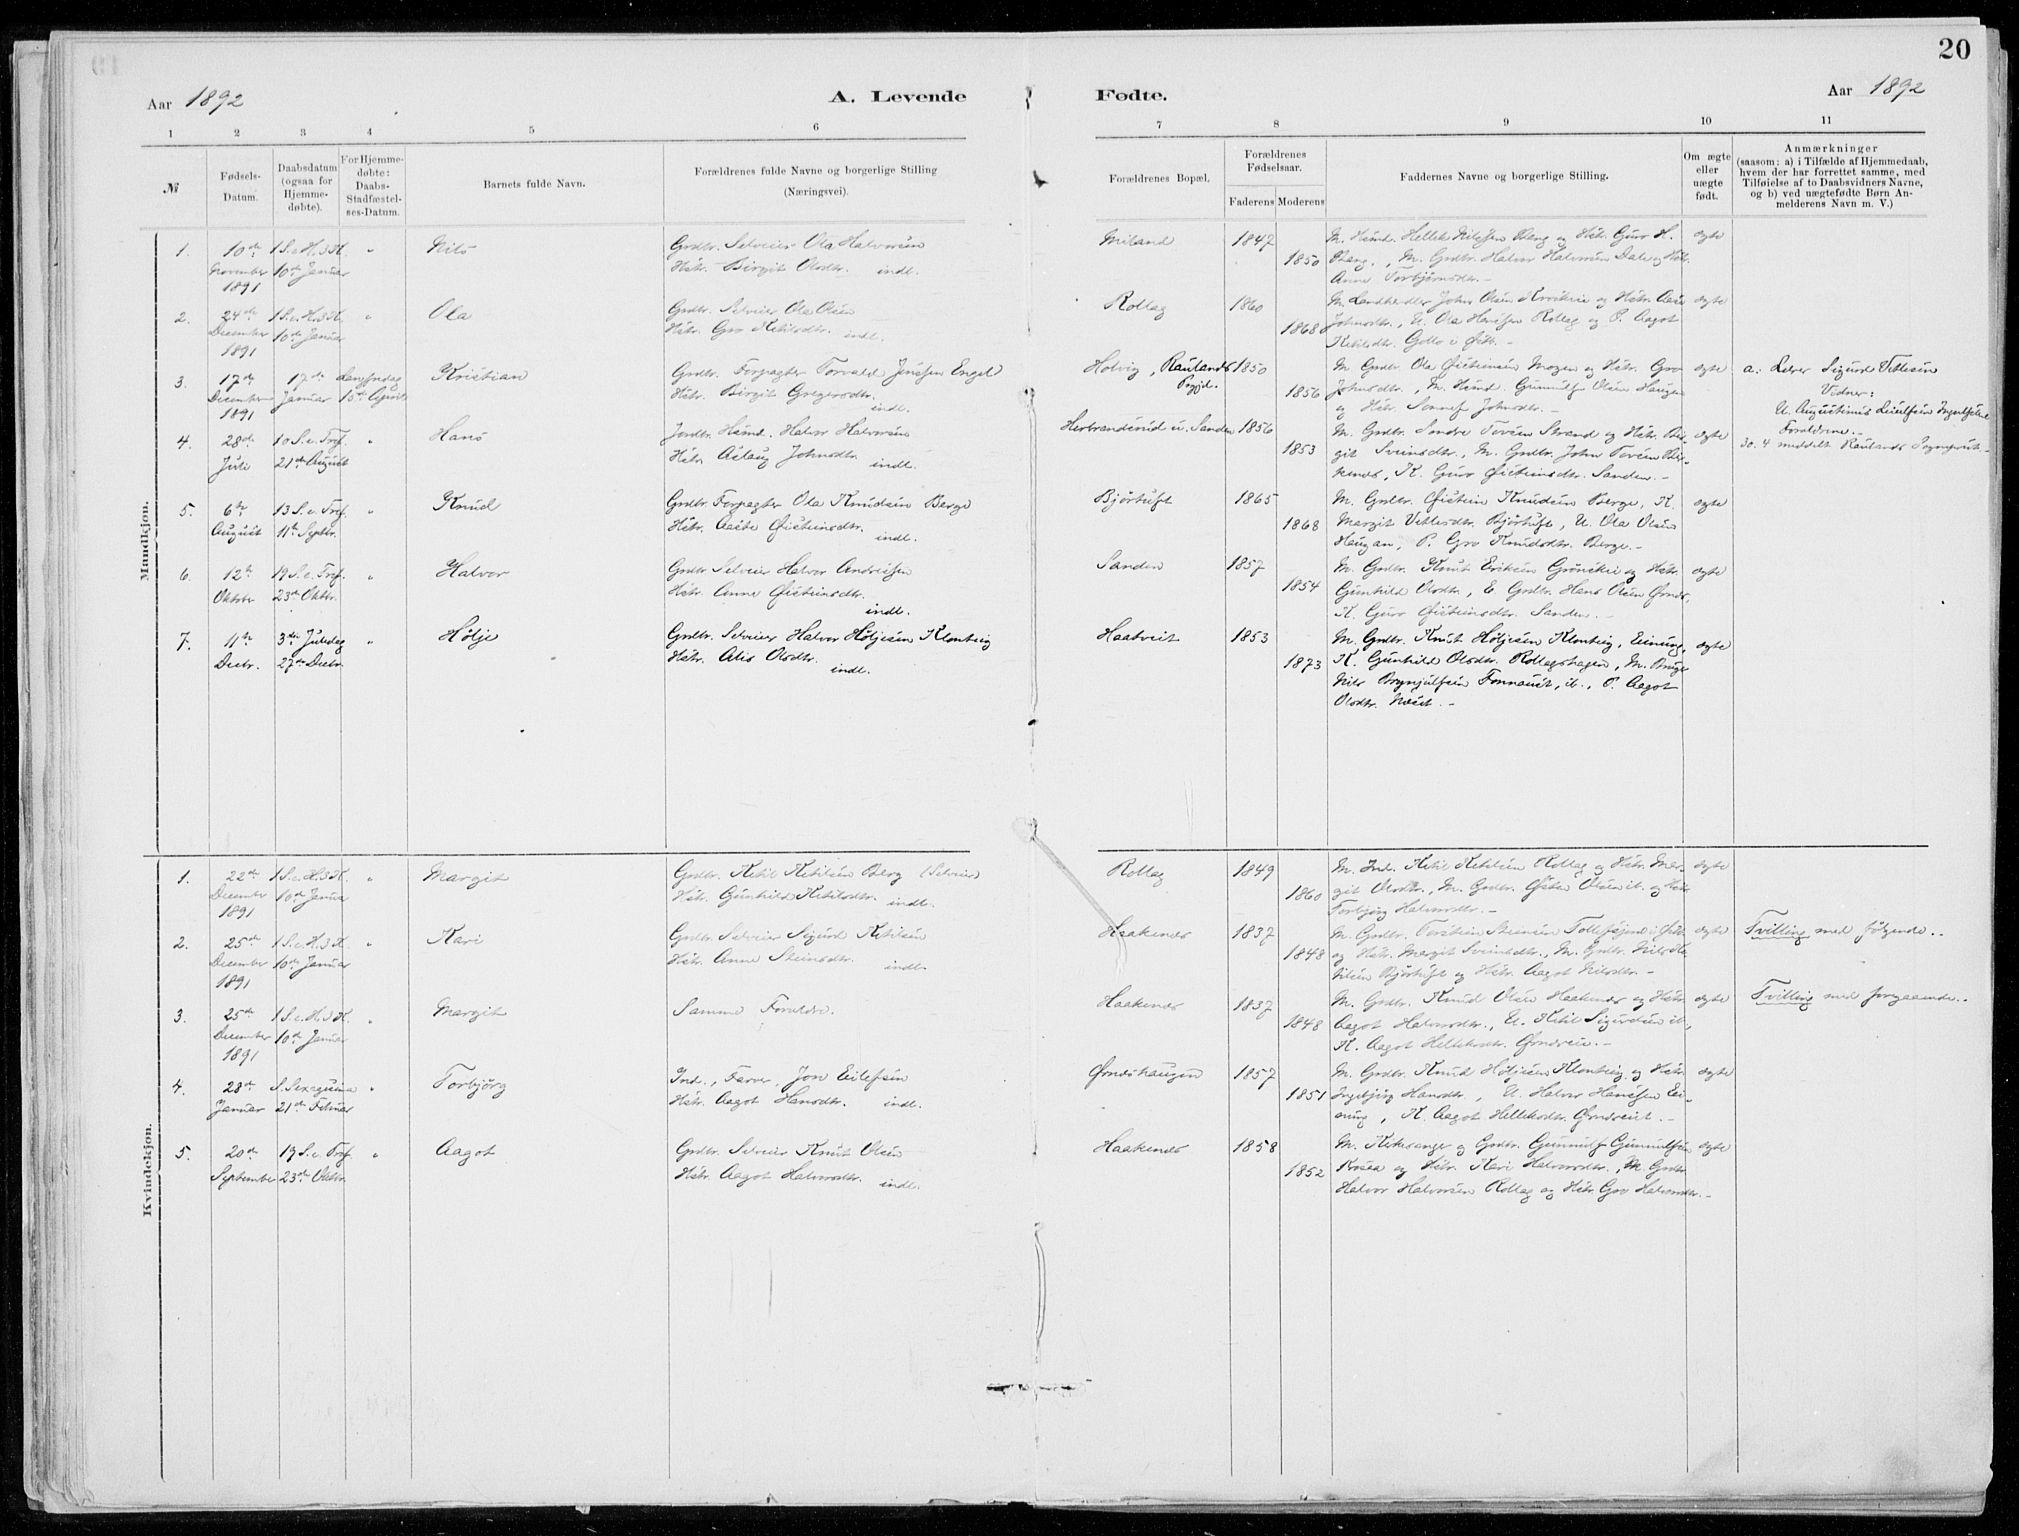 SAKO, Tinn kirkebøker, F/Fb/L0002: Ministerialbok nr. II 2, 1878-1917, s. 20